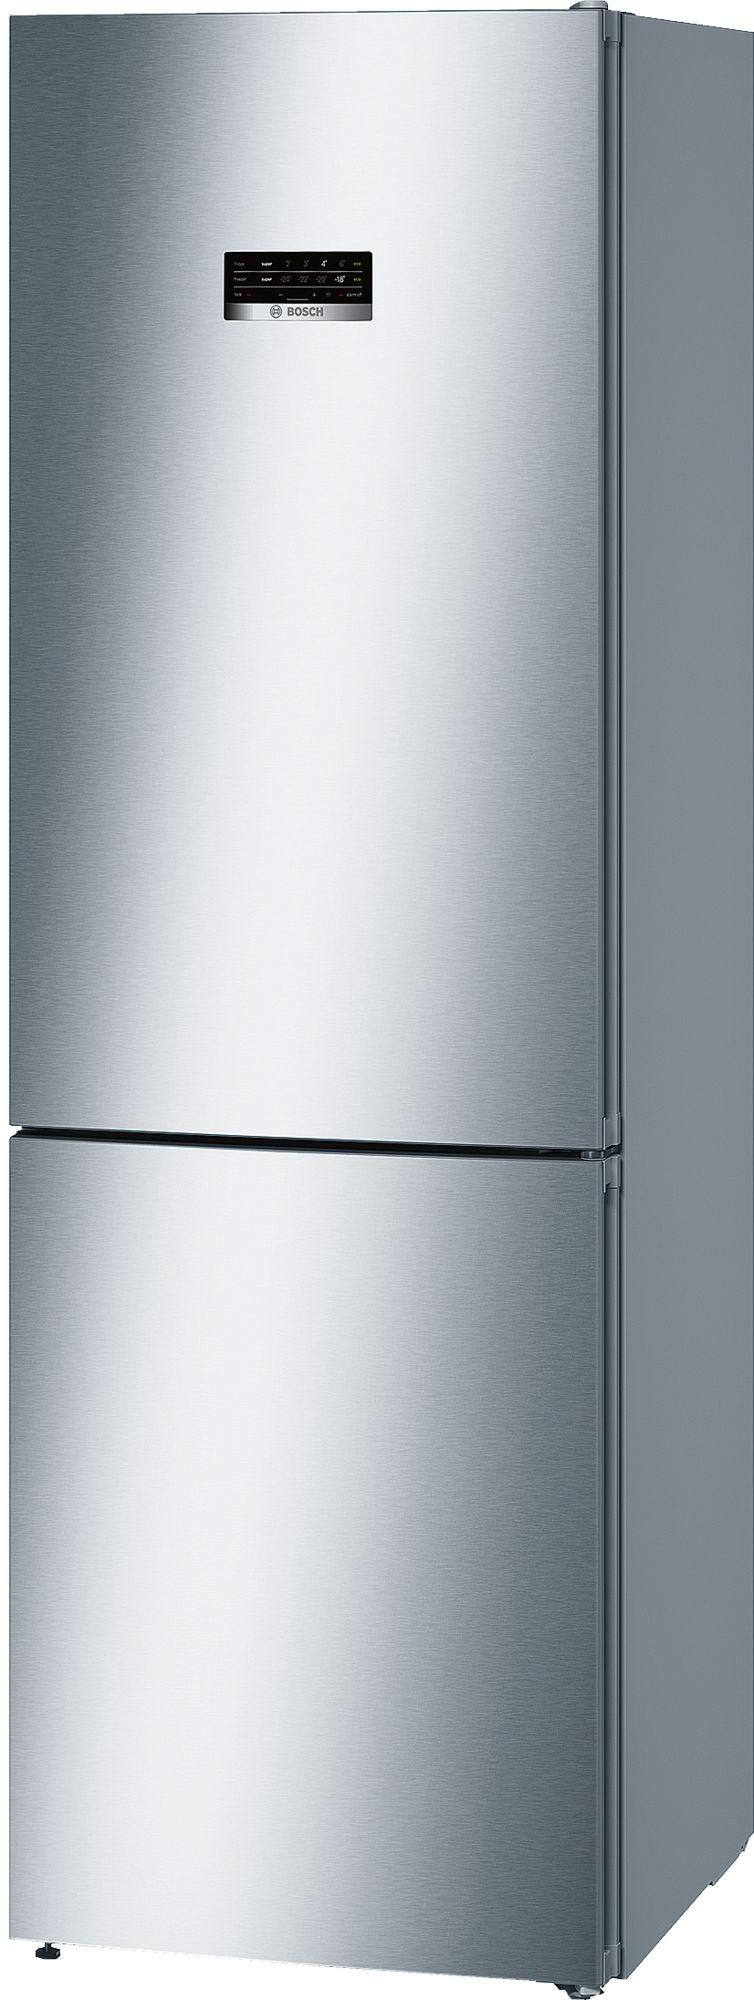 BOSCH ตู้เย็น รุ่น KGN36XI46